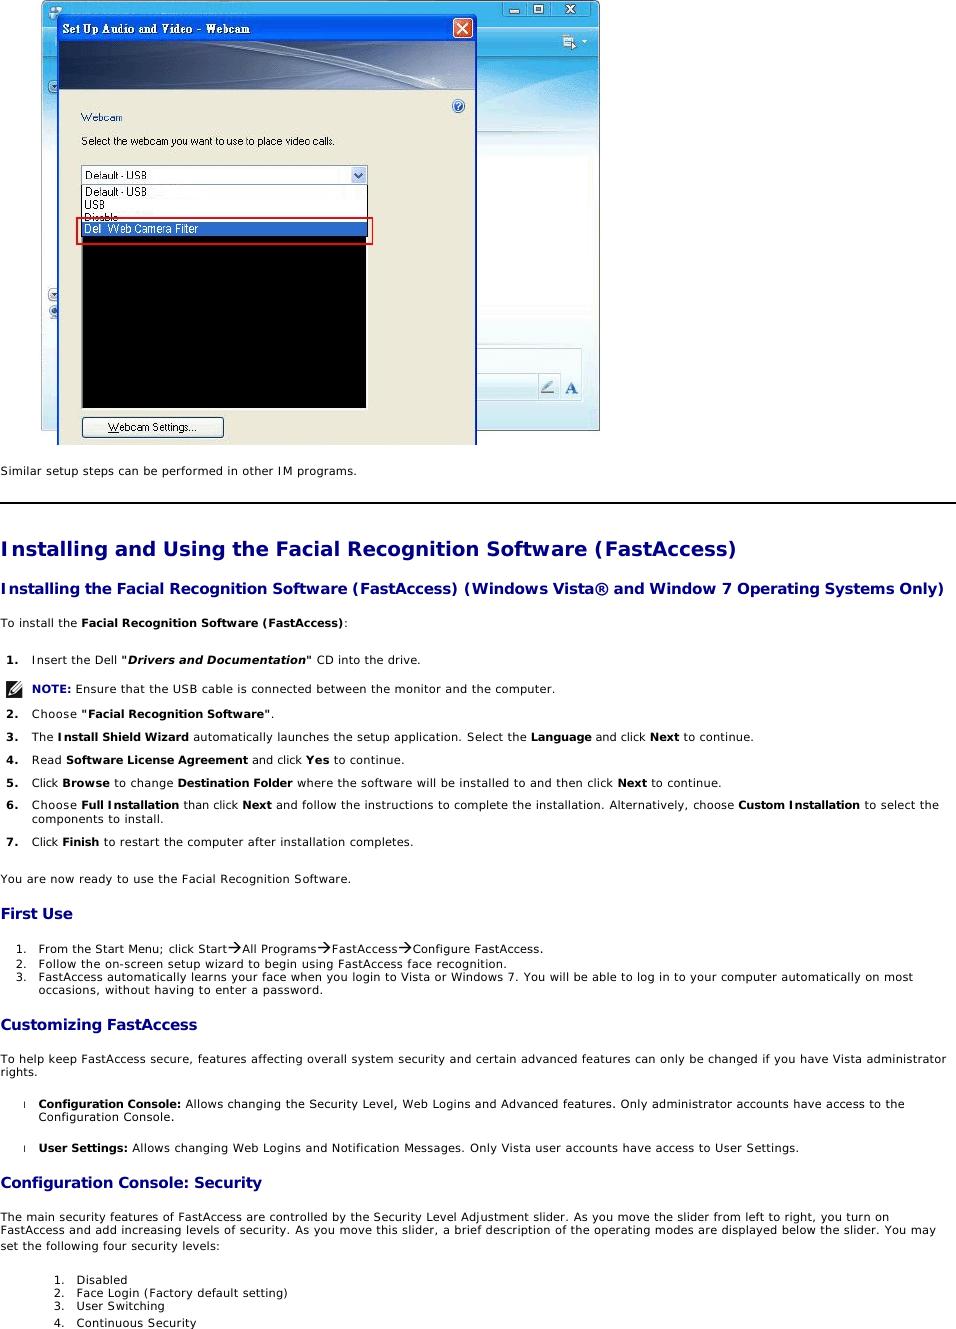 Dell d2201 Monitor User's Guide User Manual En us